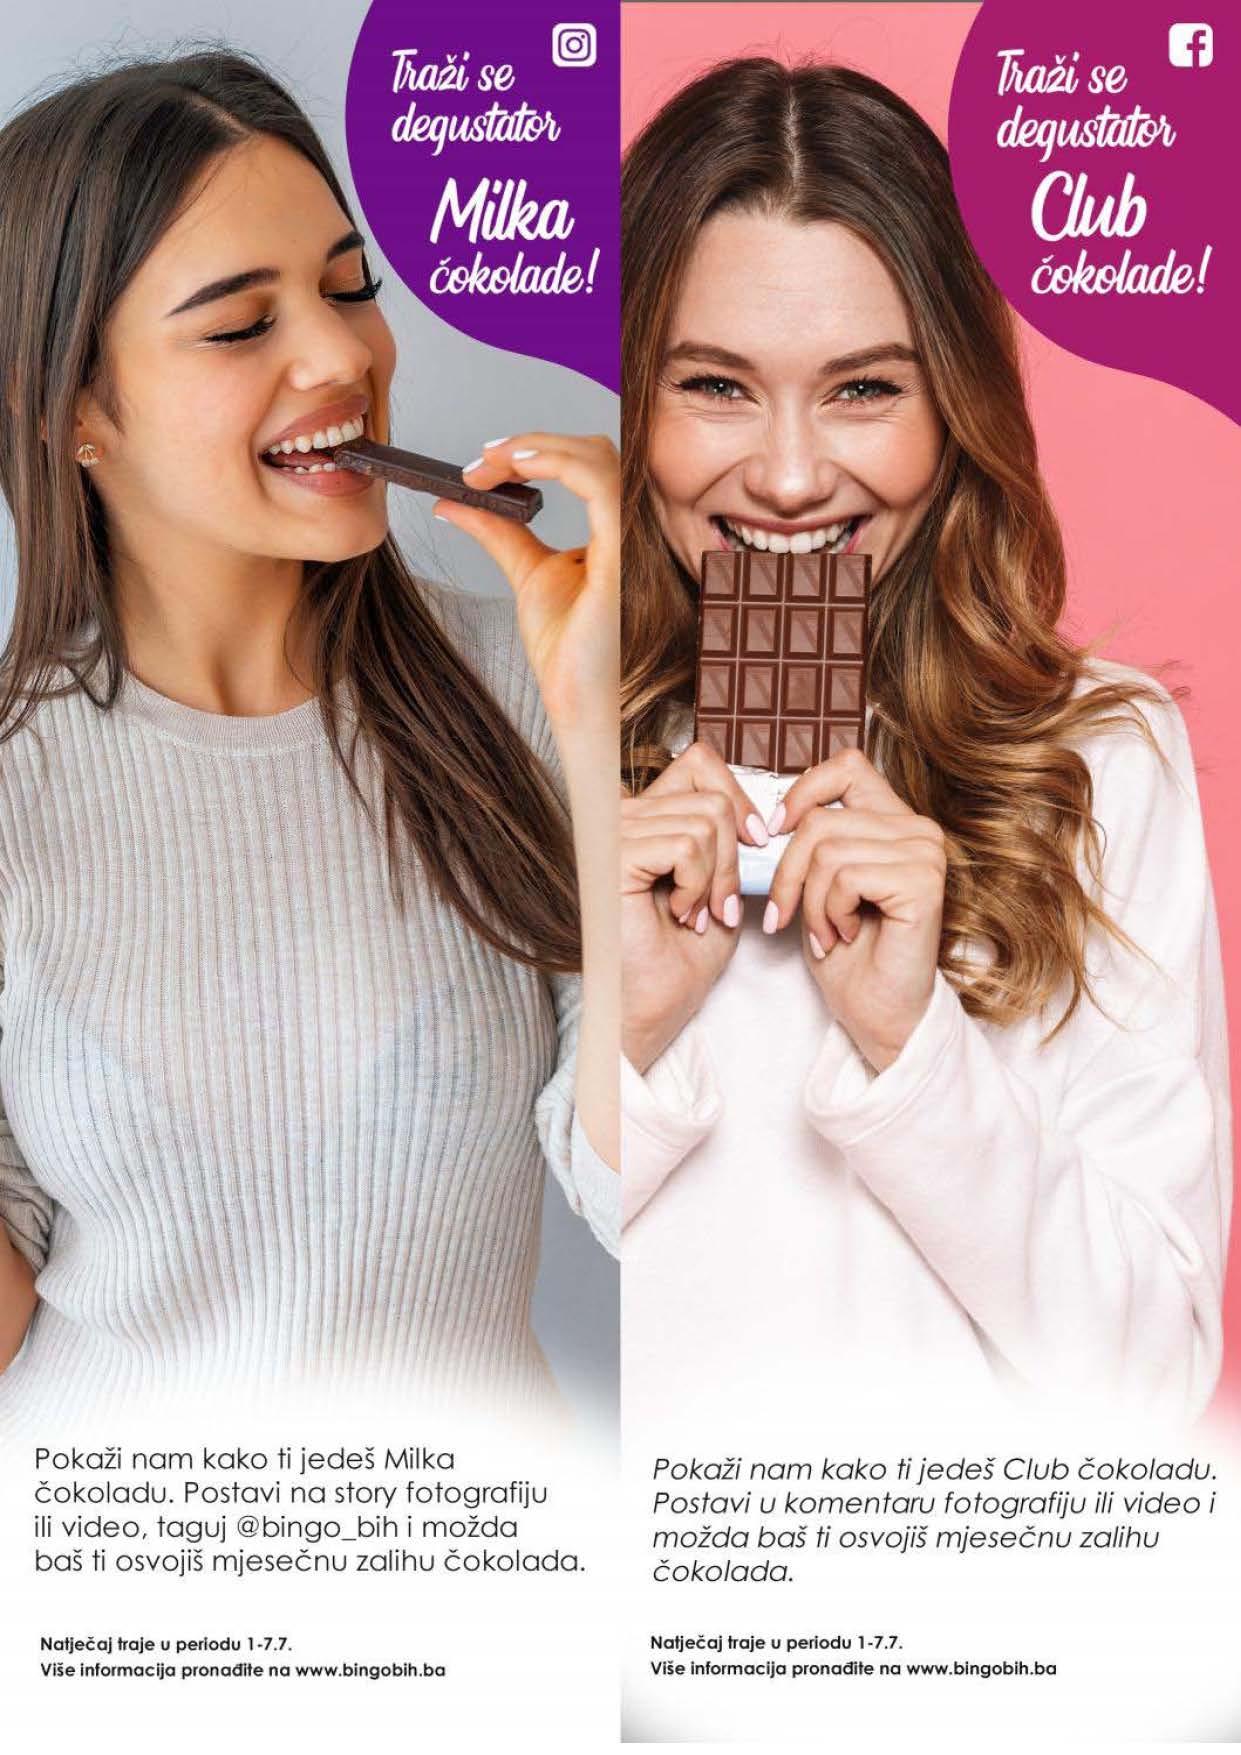 BINGO Katalog Dani cokolade JUL 2021 1.7.2021. 7.7.2021. Page 6